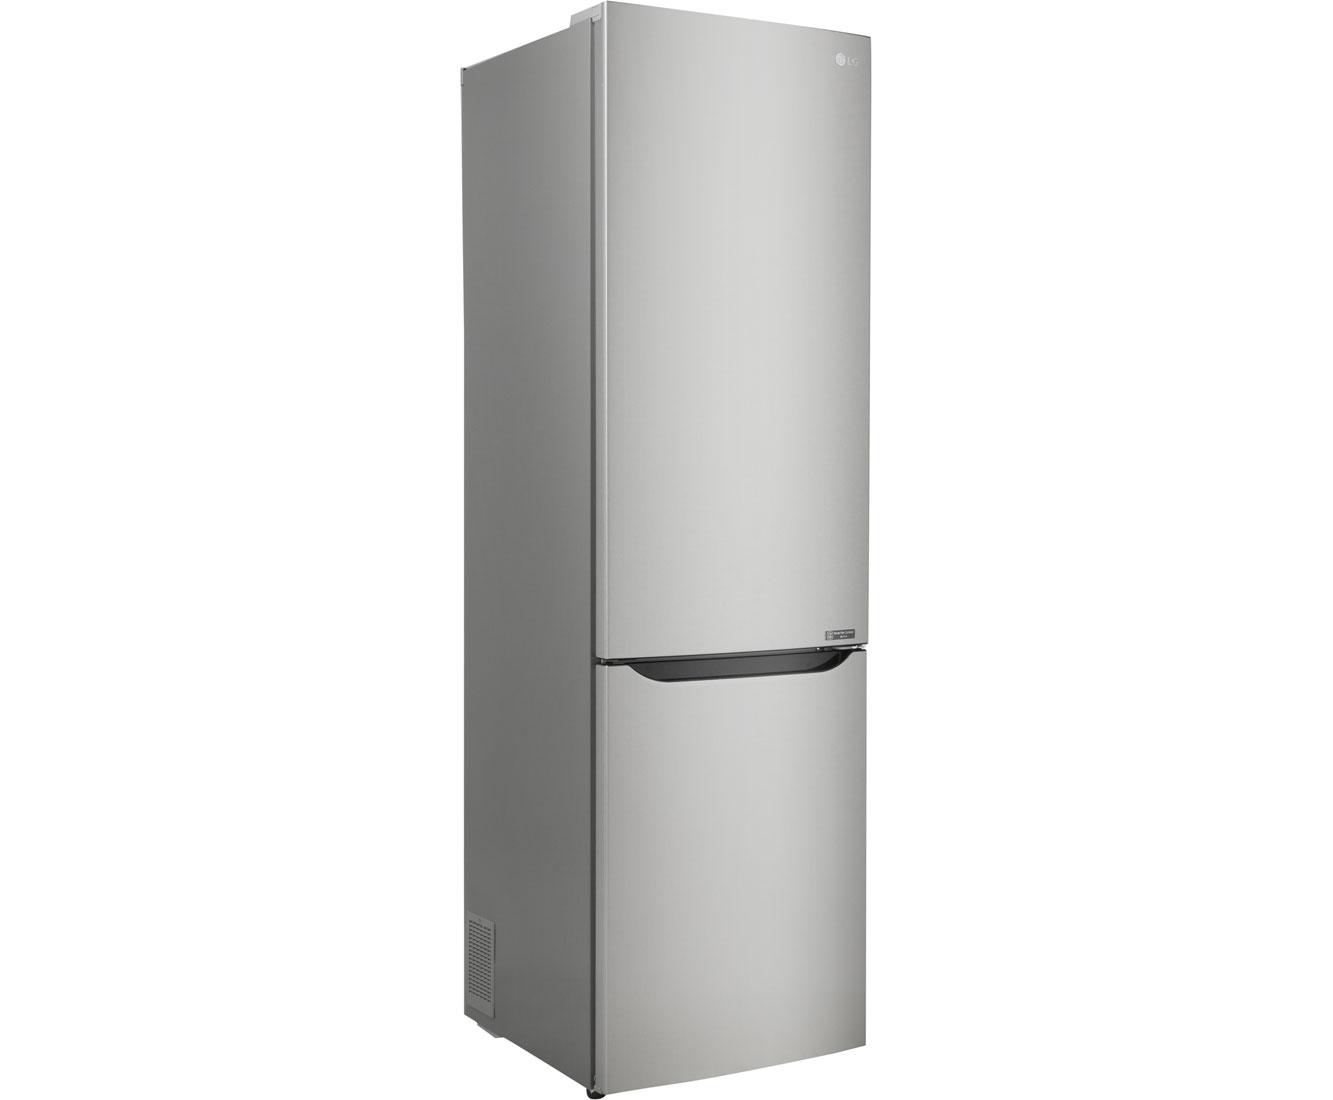 Amica Kühlschrank Expert : Rabatt preisvergleich.de kühlen & gefrieren u003e kühl gefrierkombination